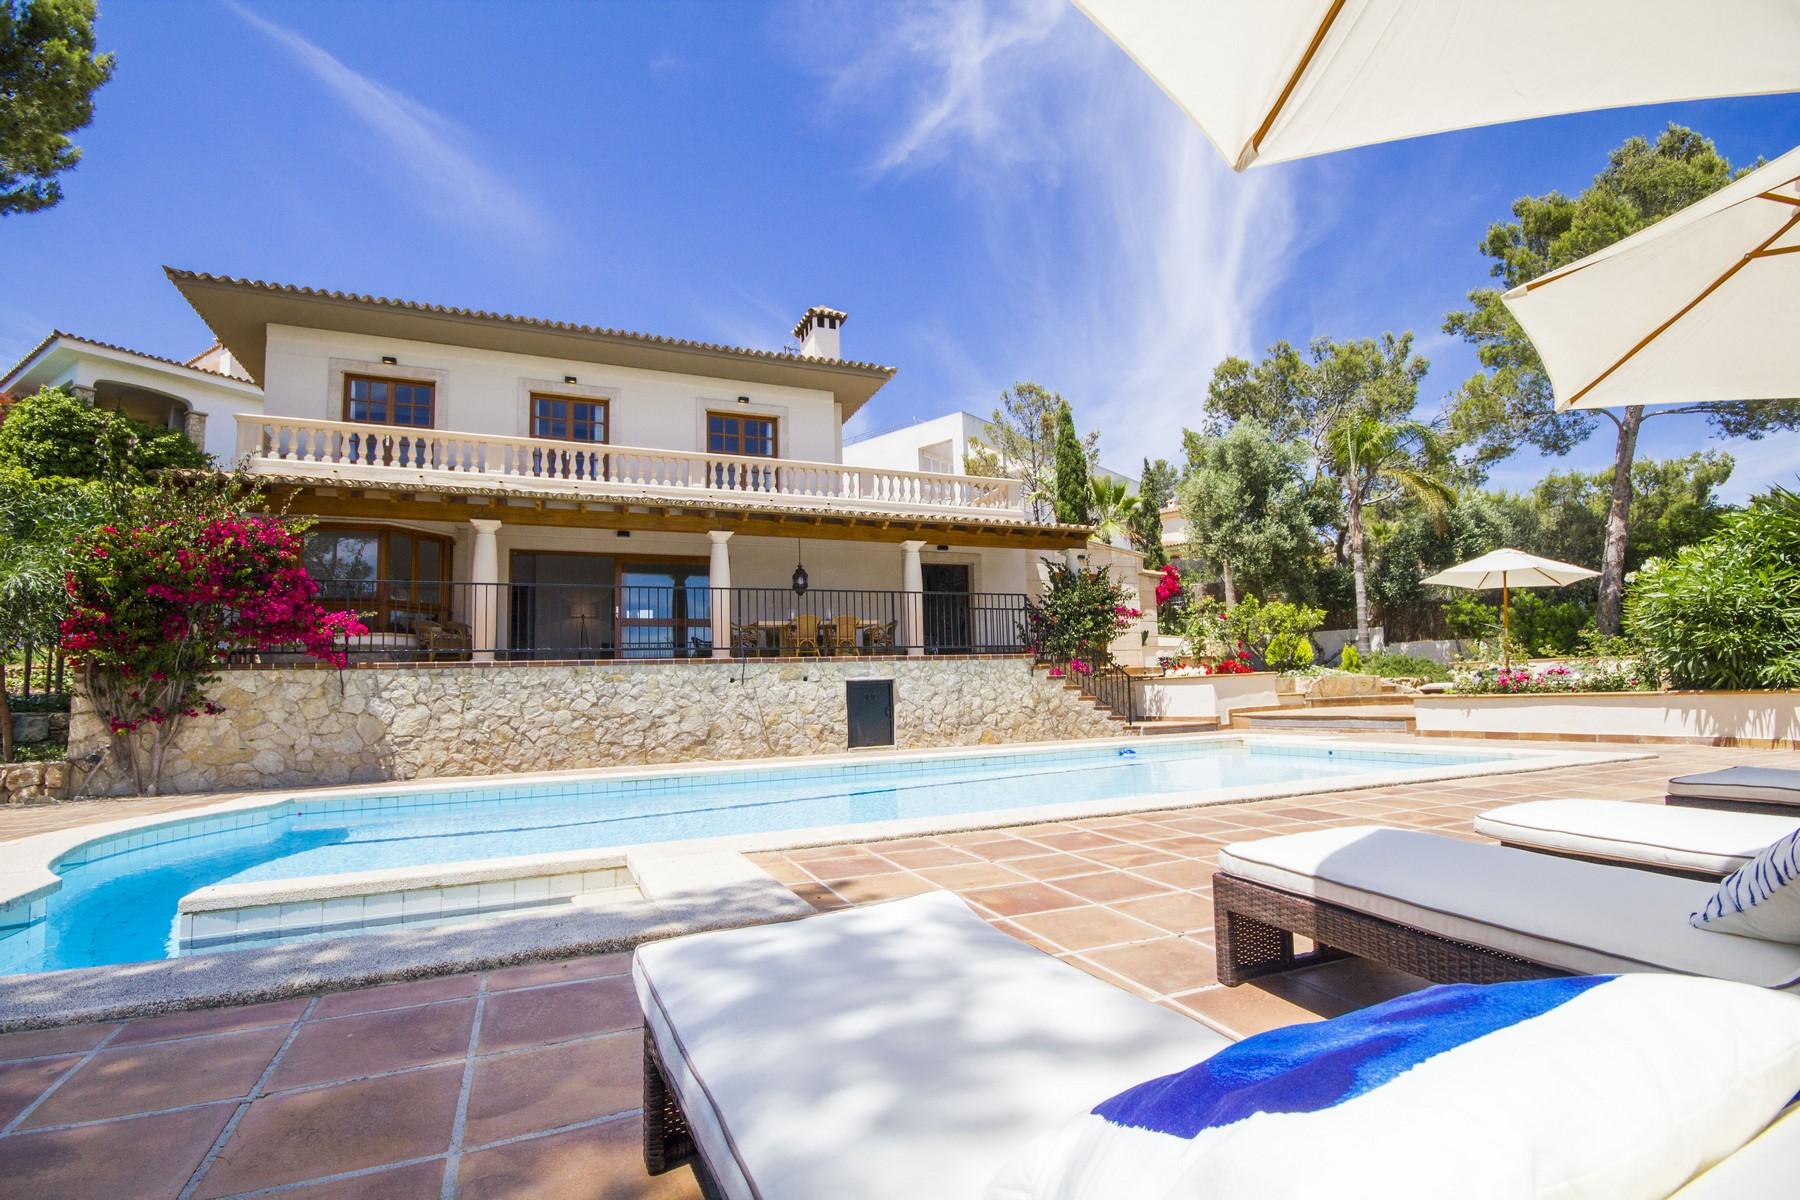 Single Family Home for Rent at Comfortable villa in Cas Catala Cas Catala, Mallorca, 07180 Spain